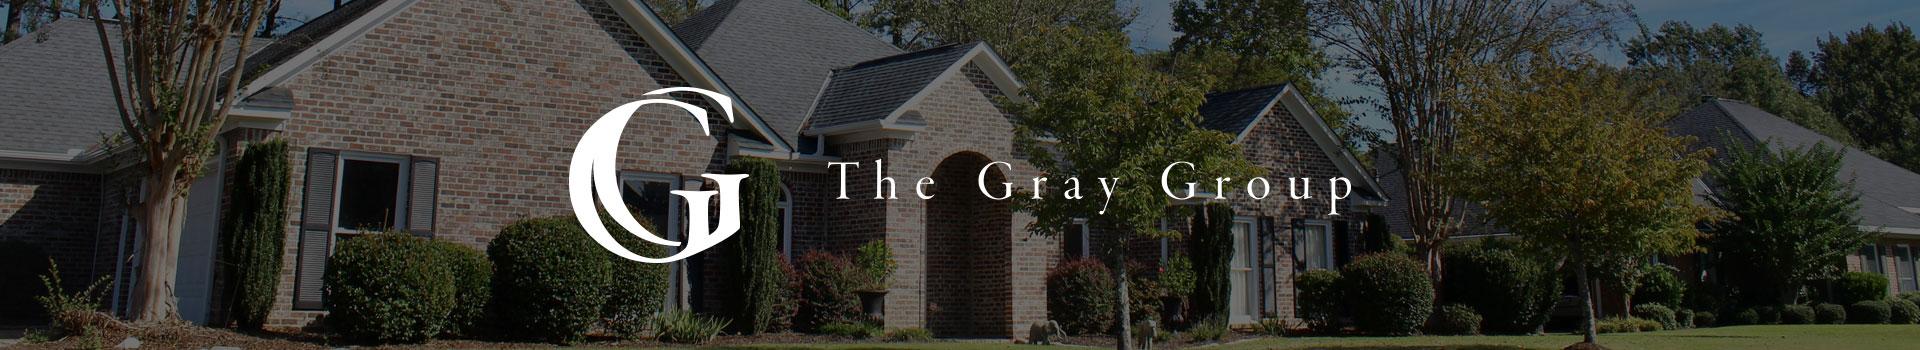 Greystone - The Gray Group at Keller Williams Realty